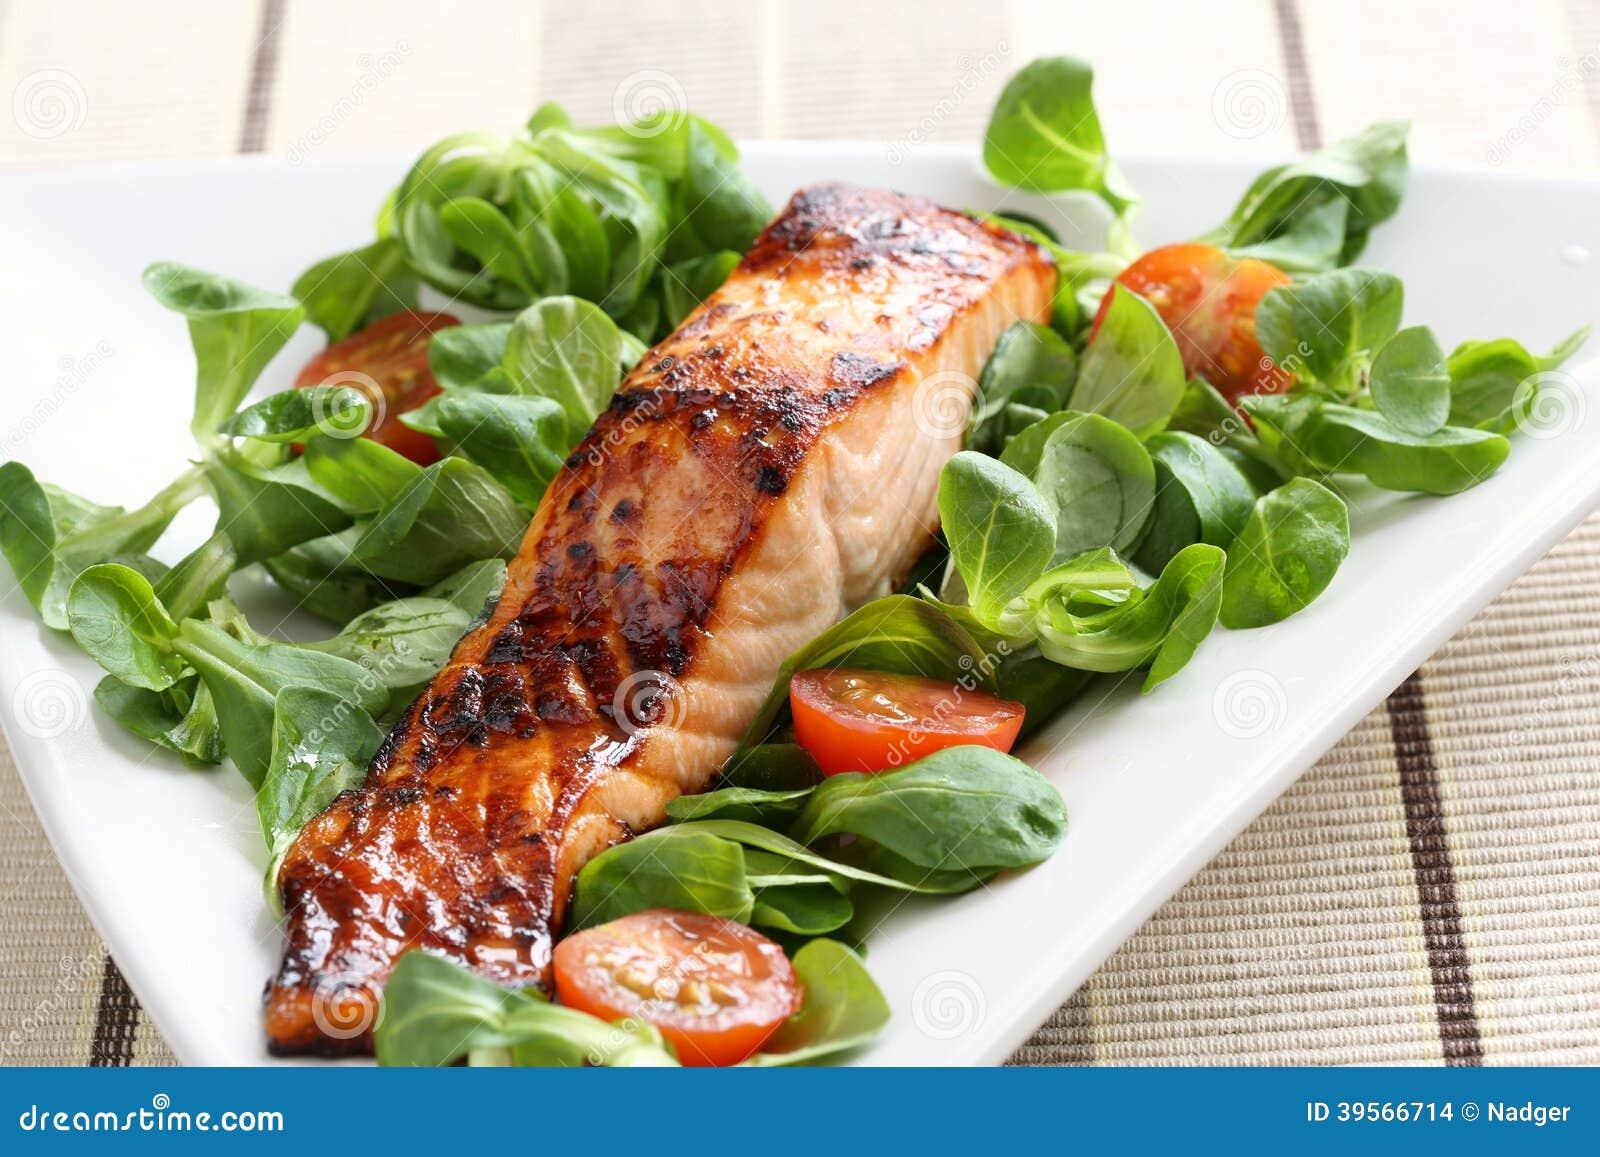 Grilled salmon with honey glaze